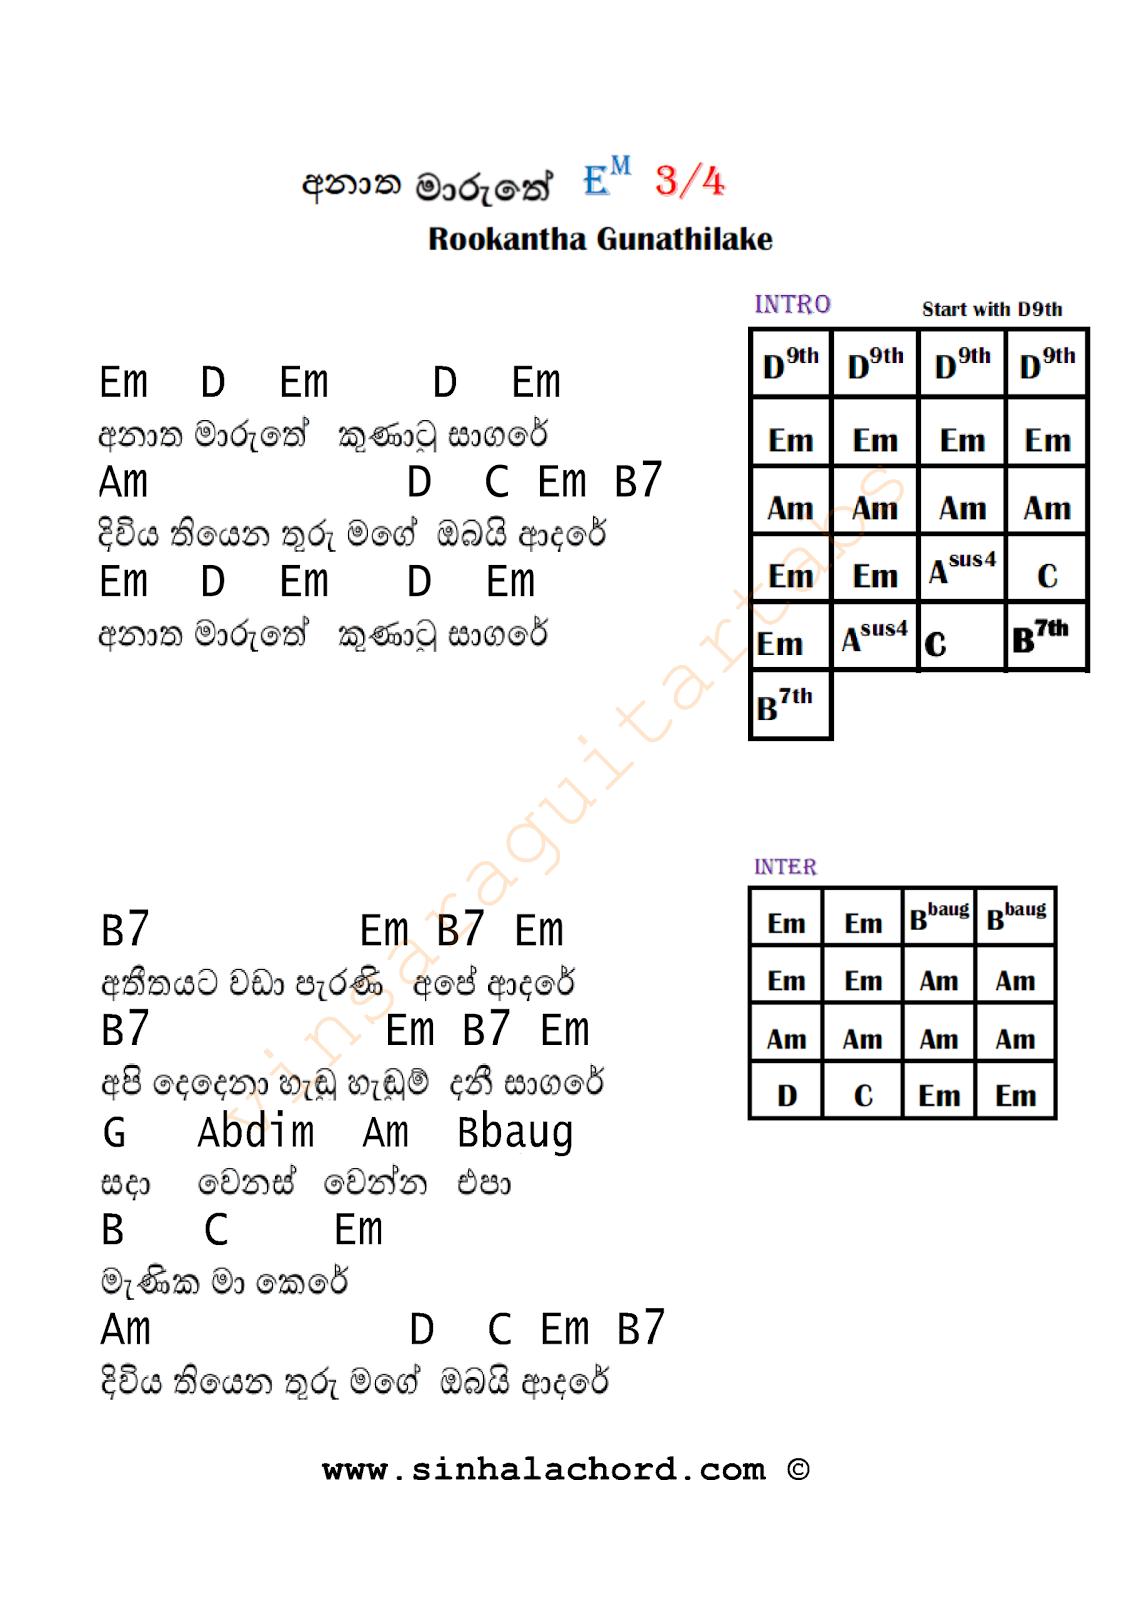 Anatha Maruthe -Rookantha Gunathilake | Sinhala Guitar Chords